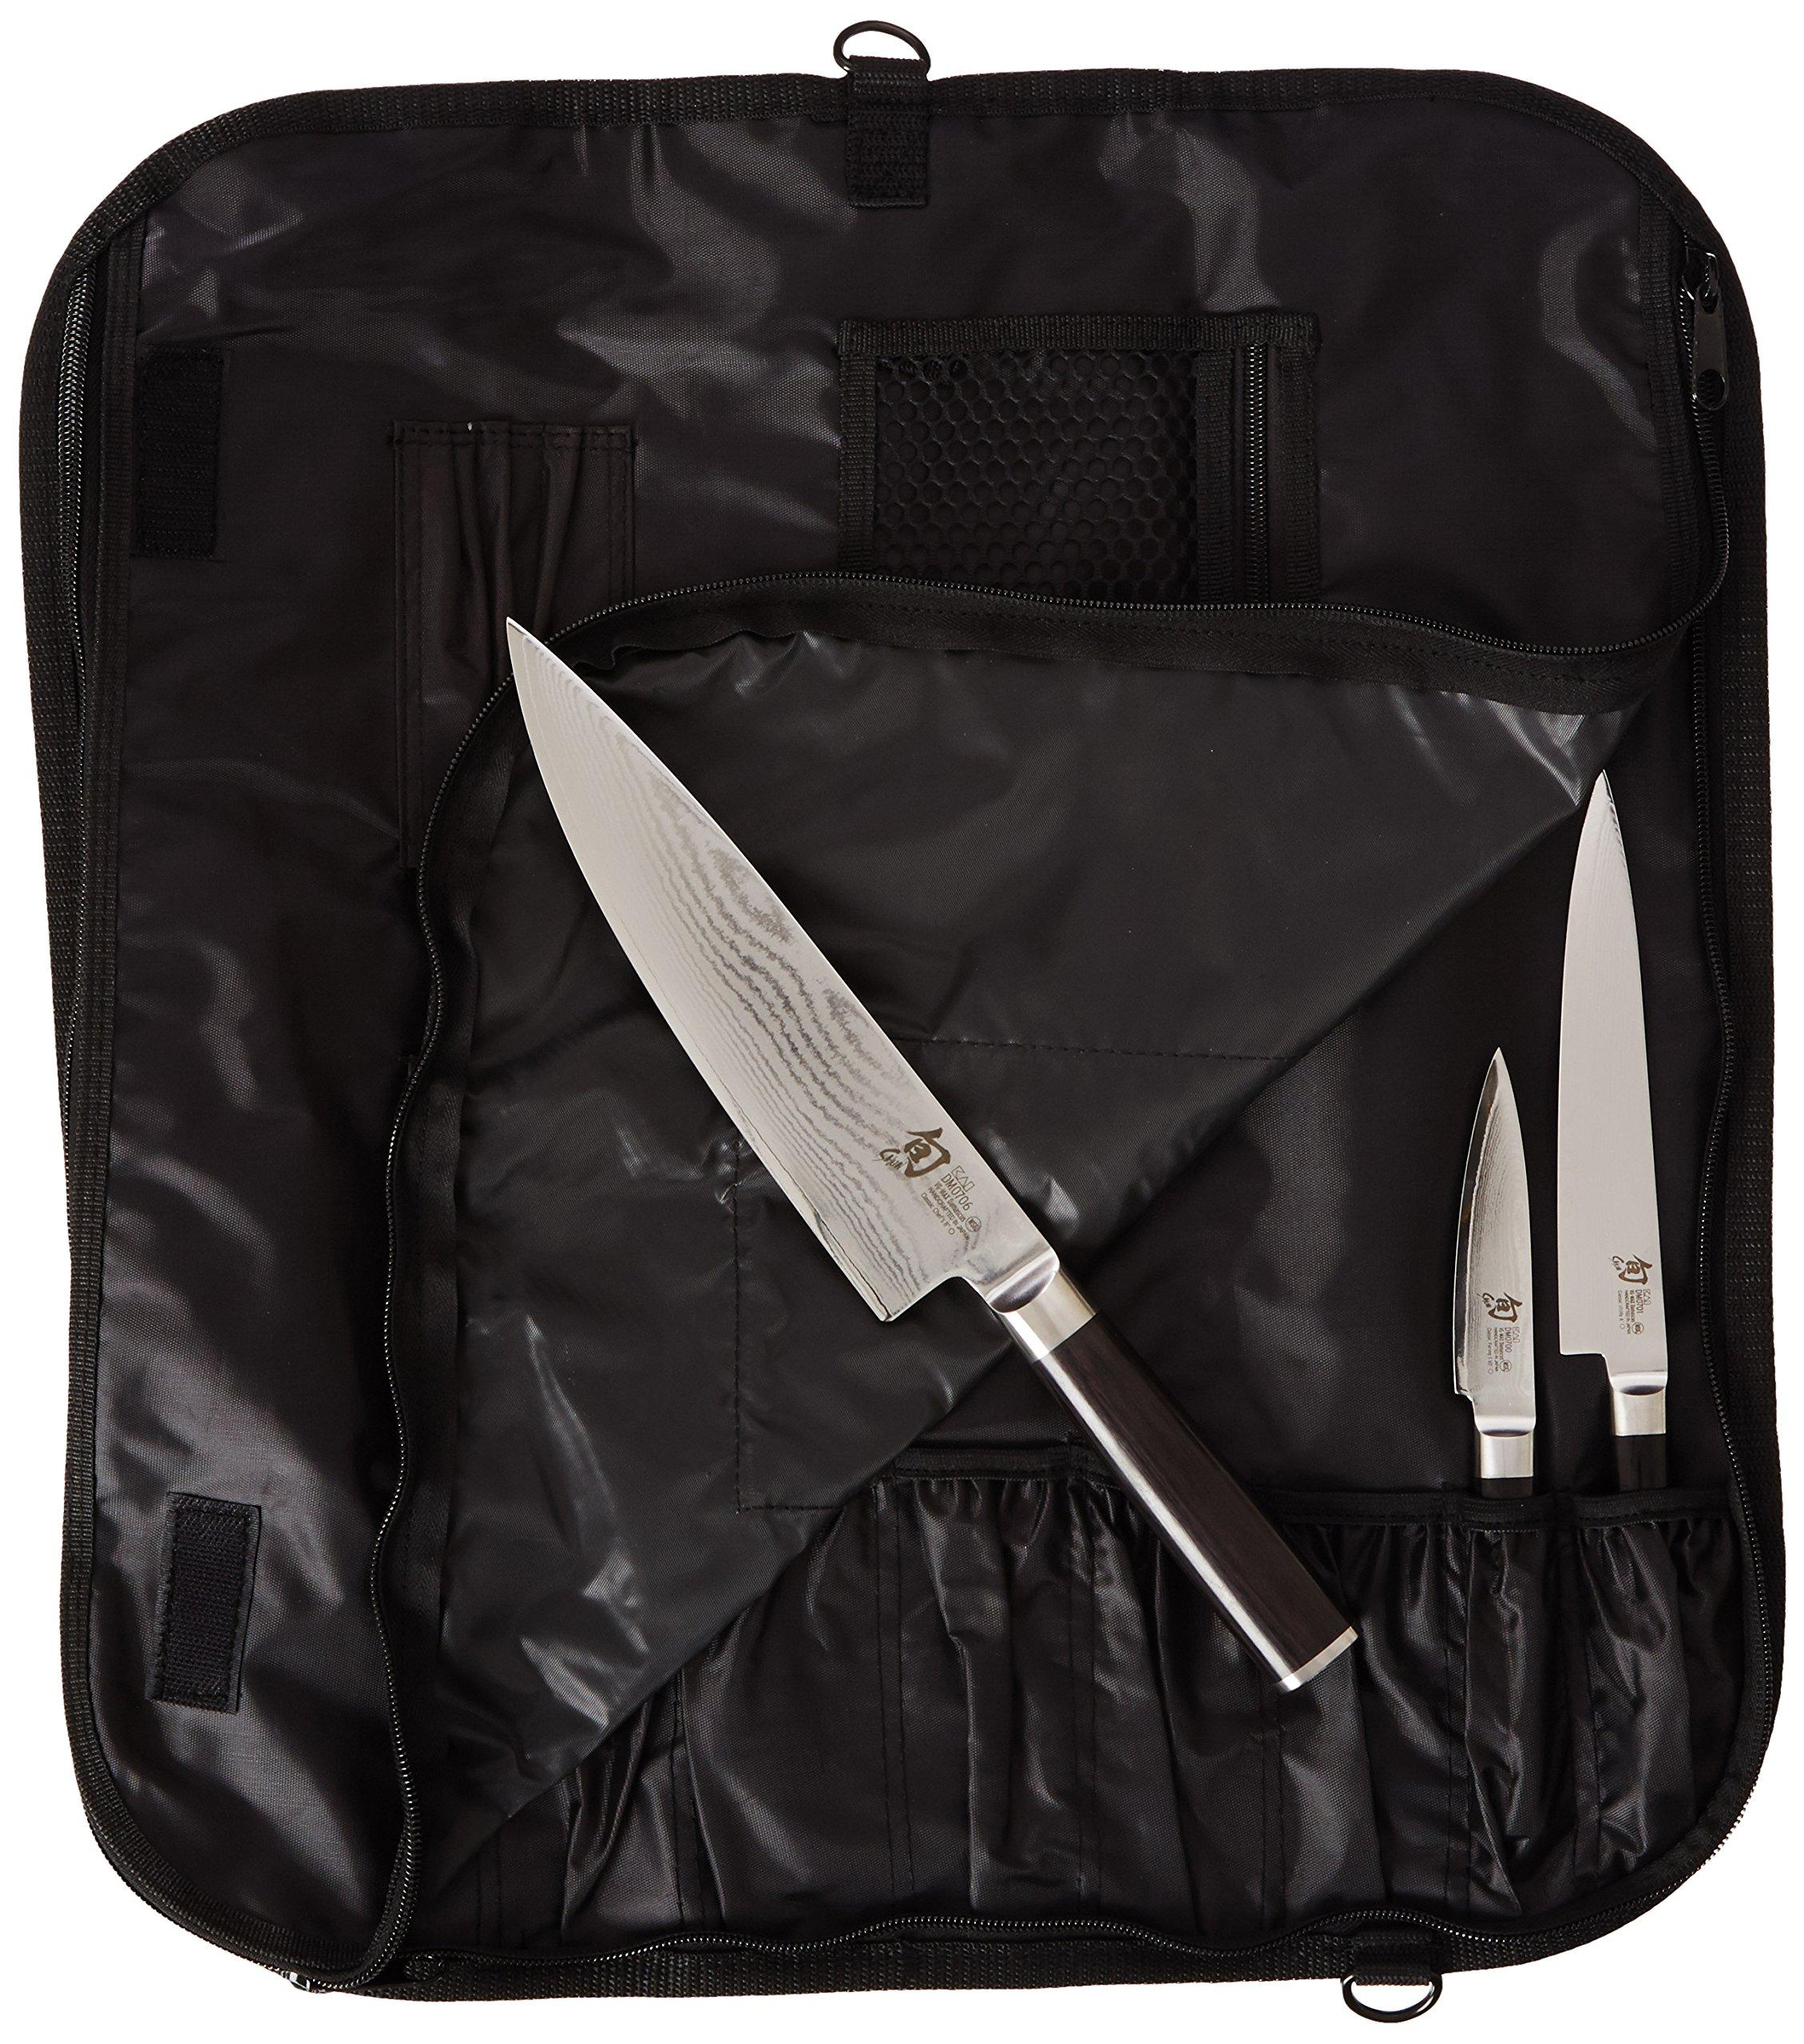 Shun DMS0499 4-Piece Classic Student Knife Set